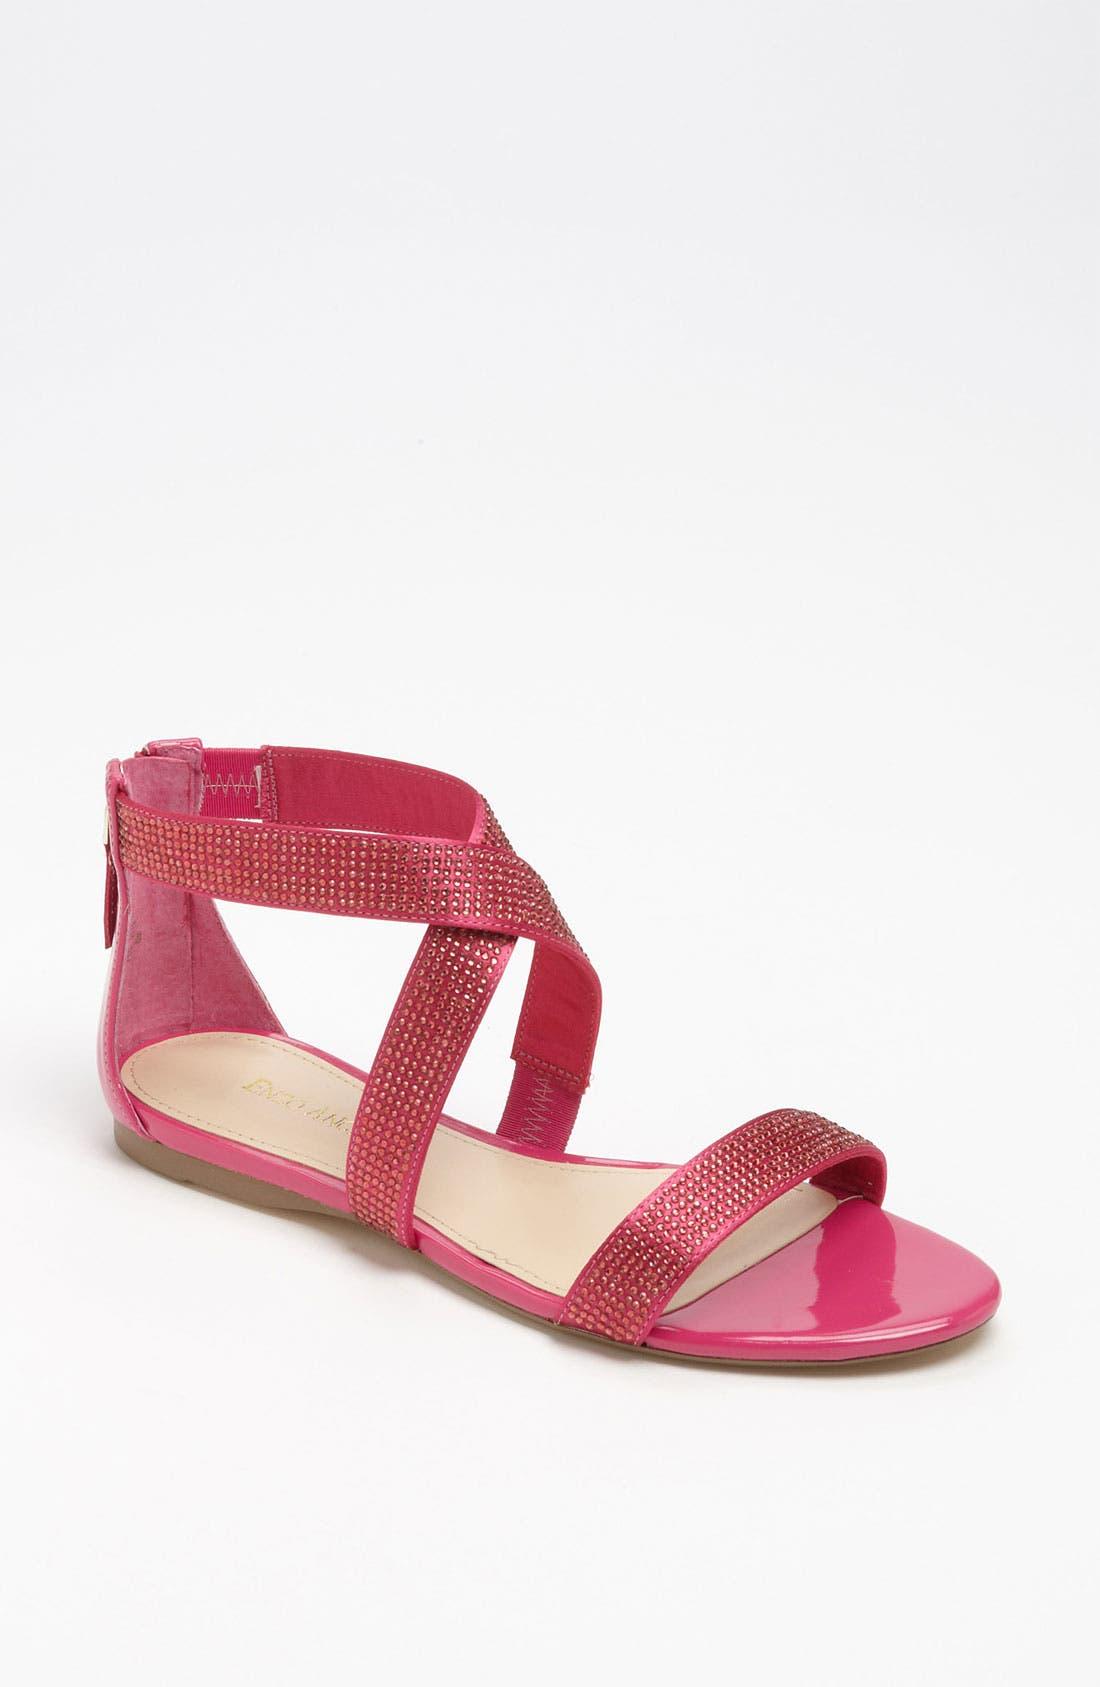 Alternate Image 1 Selected - Enzo Angiolini 'Peytin' Sandal (Special Purchase)